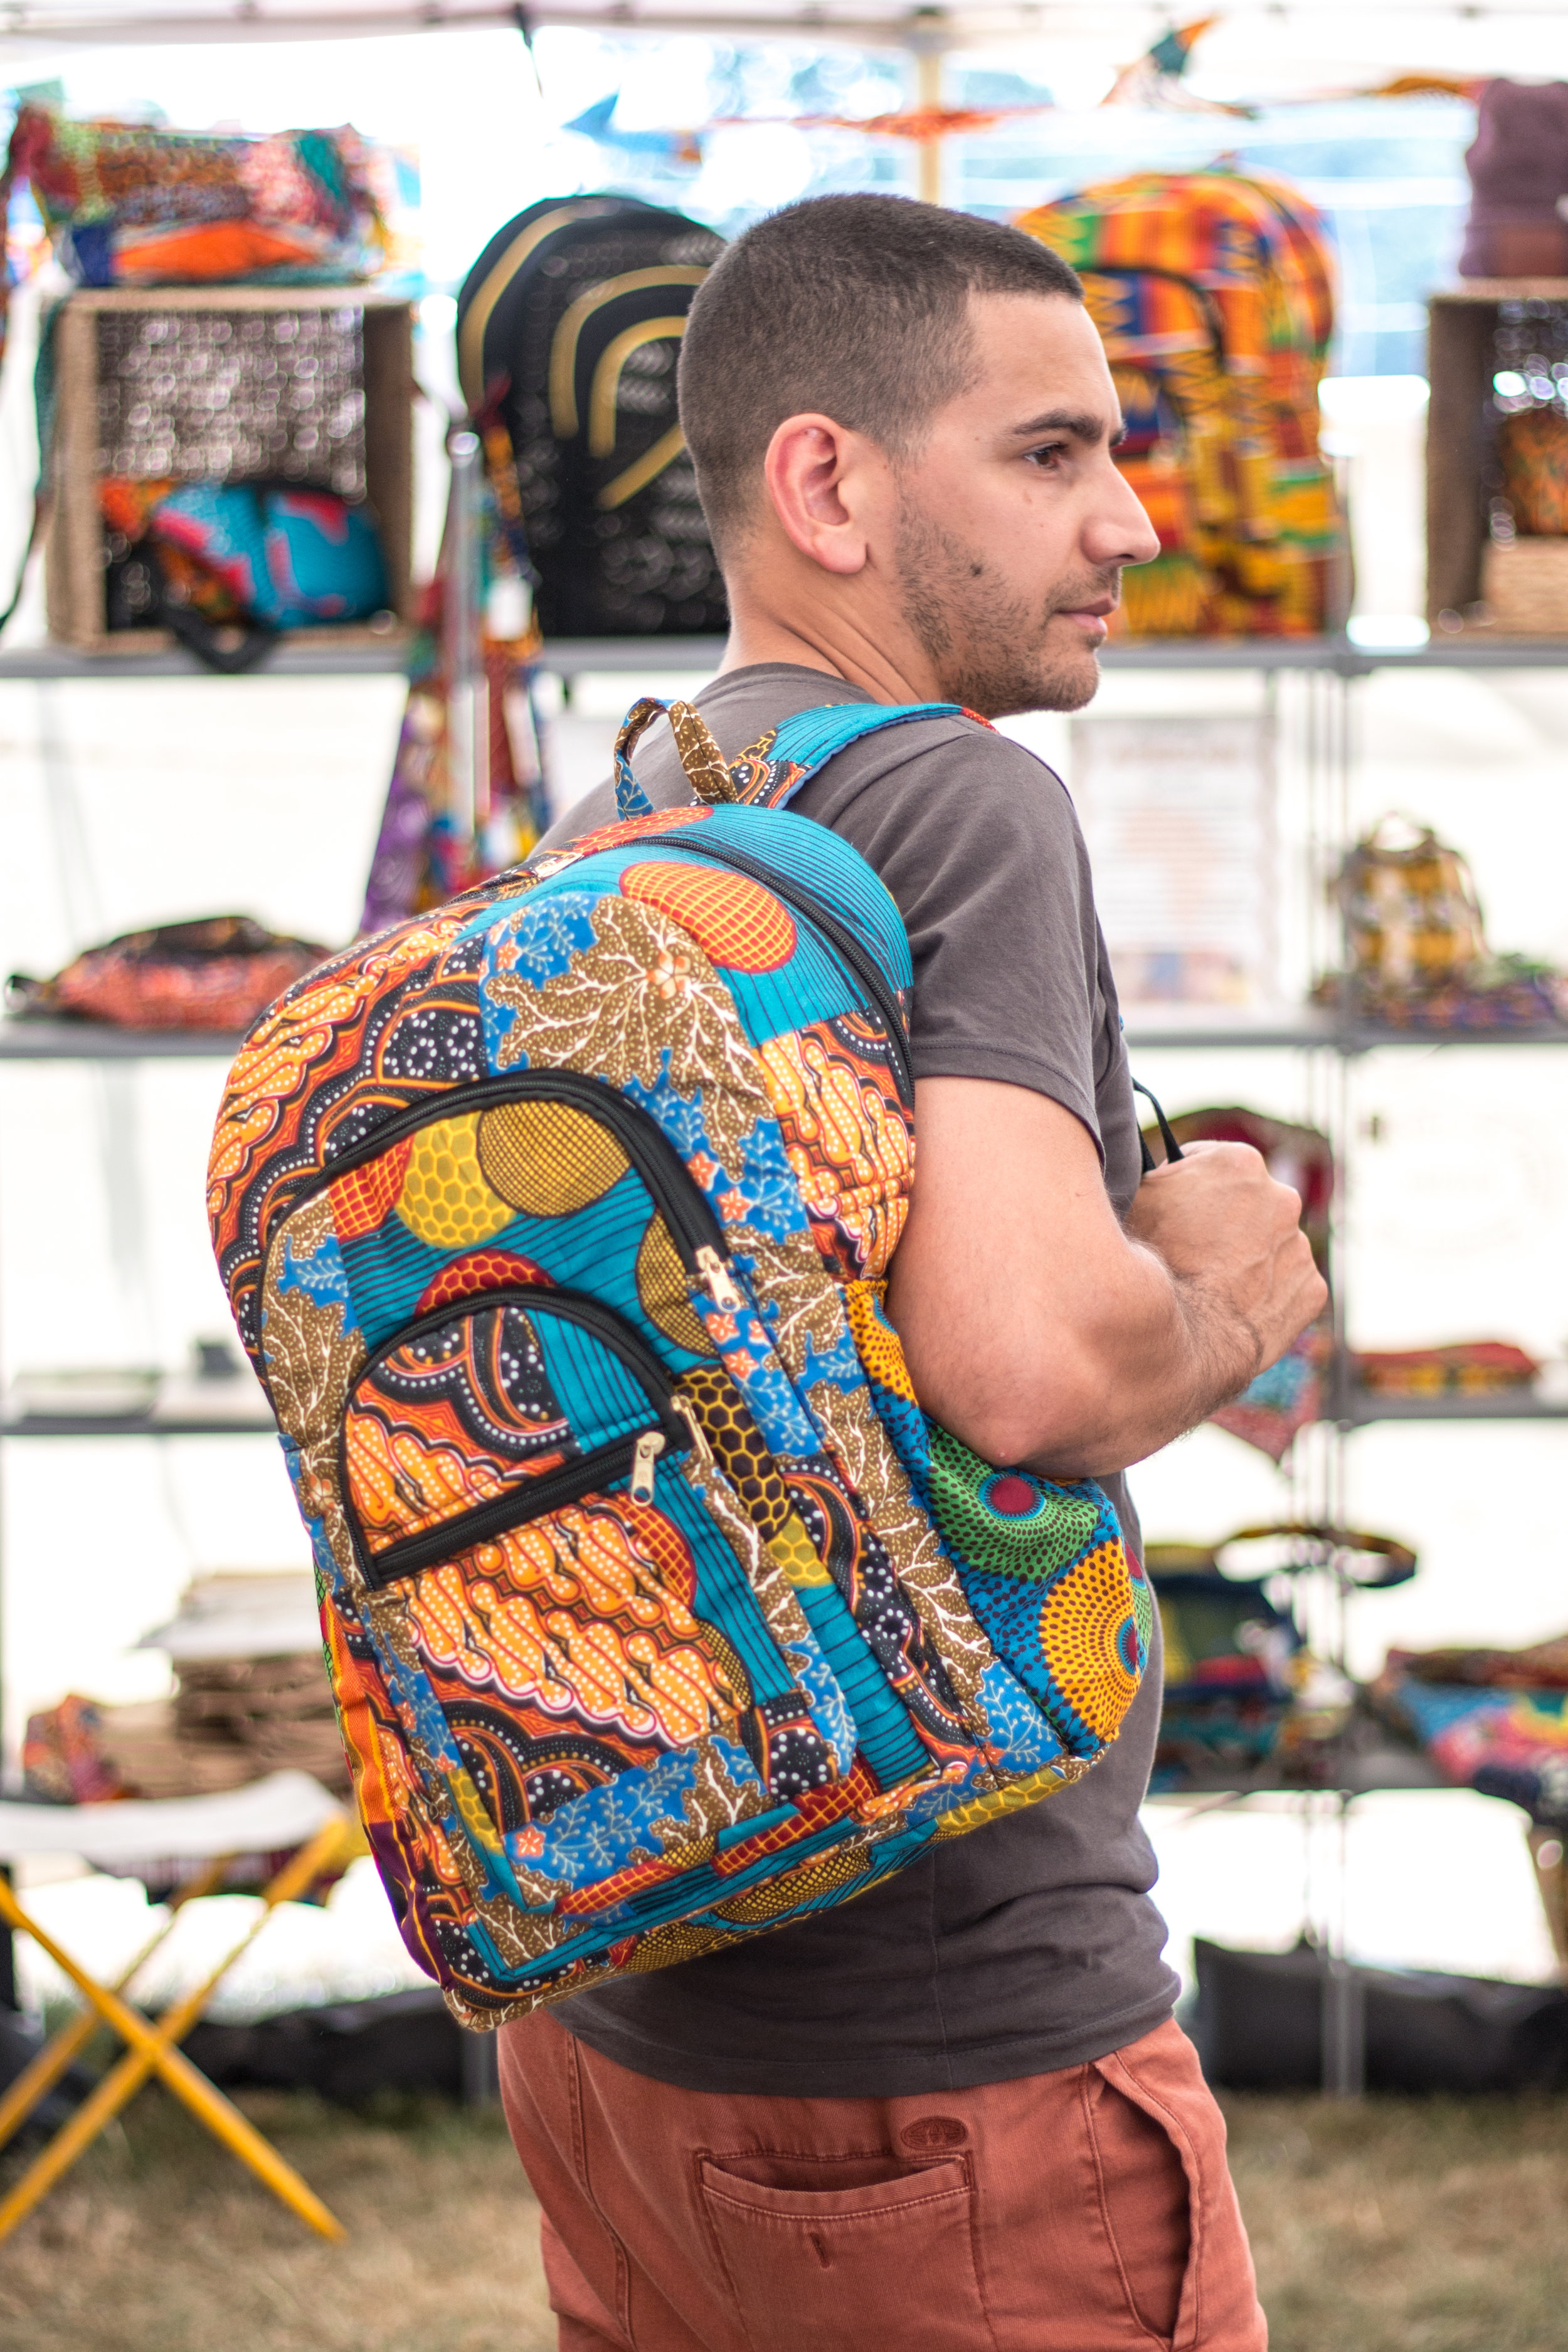 Ghanaian fabric backpack by Kobina in Cape Coast, Ghana